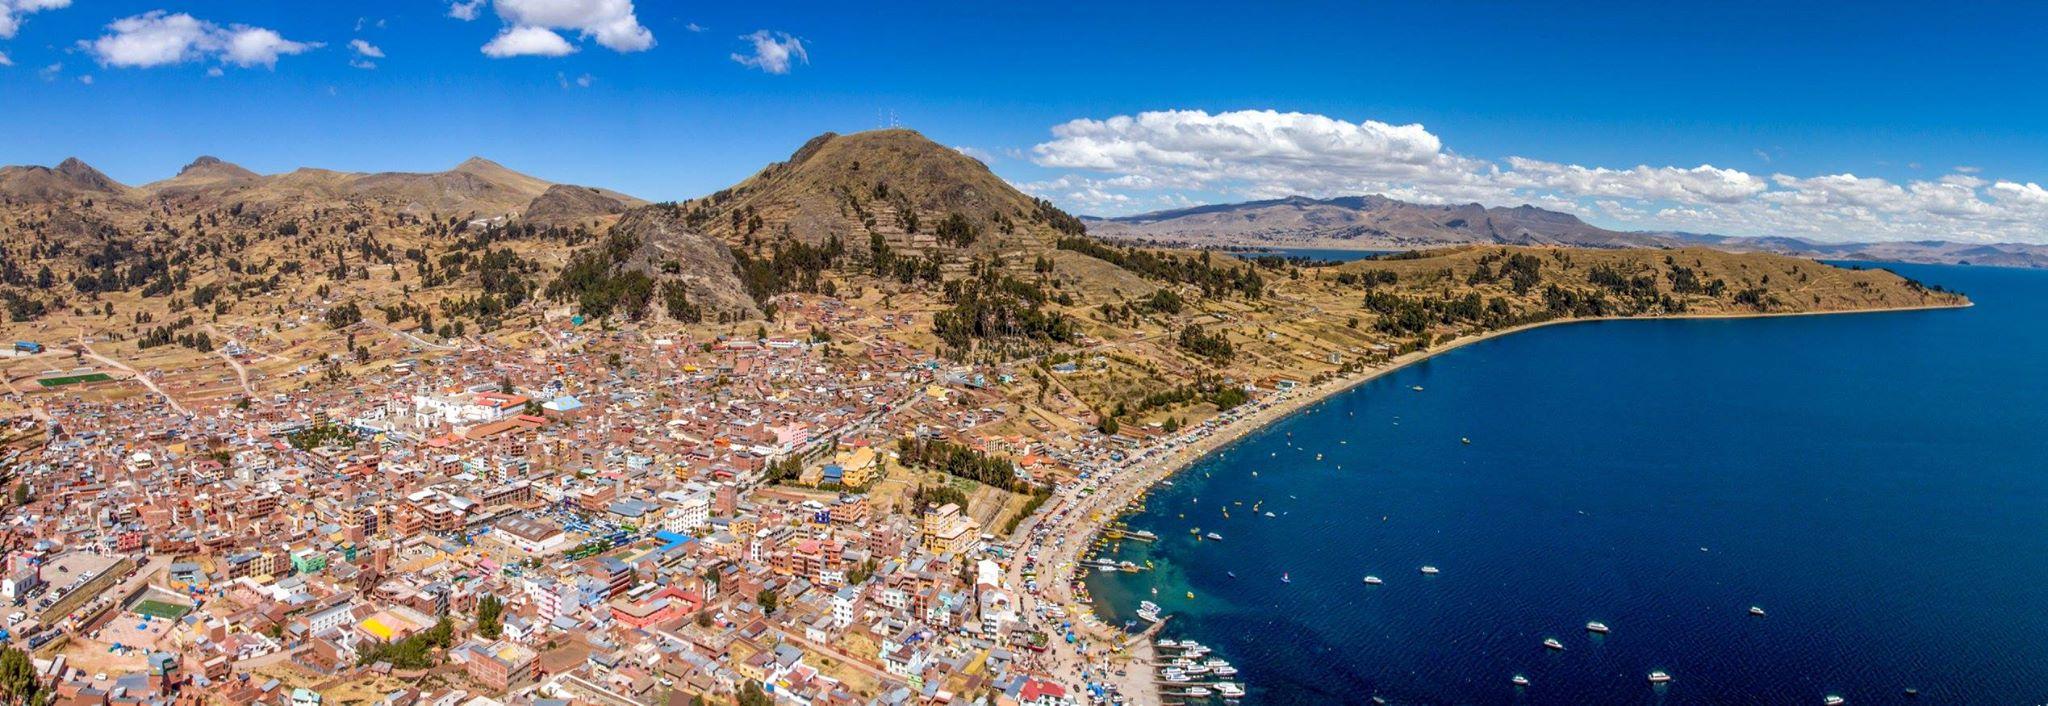 copacabana-bolivia-lake-titikaka-panorama